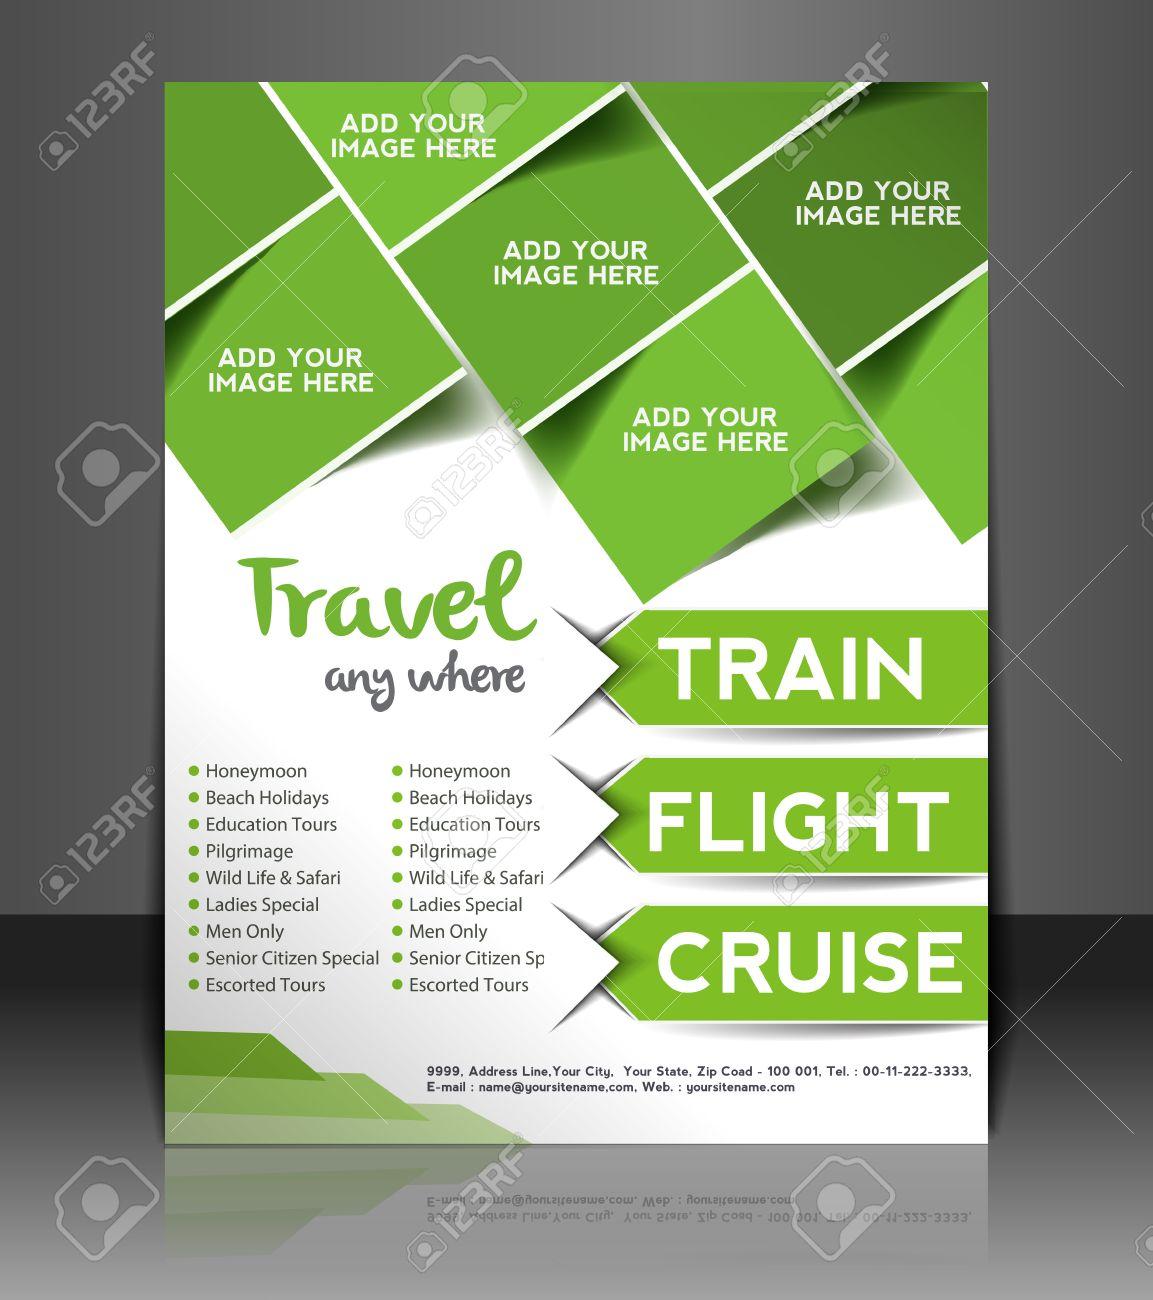 Poster design sample - Travel Center Flyer Poster Template Design Stock Vector 26704098